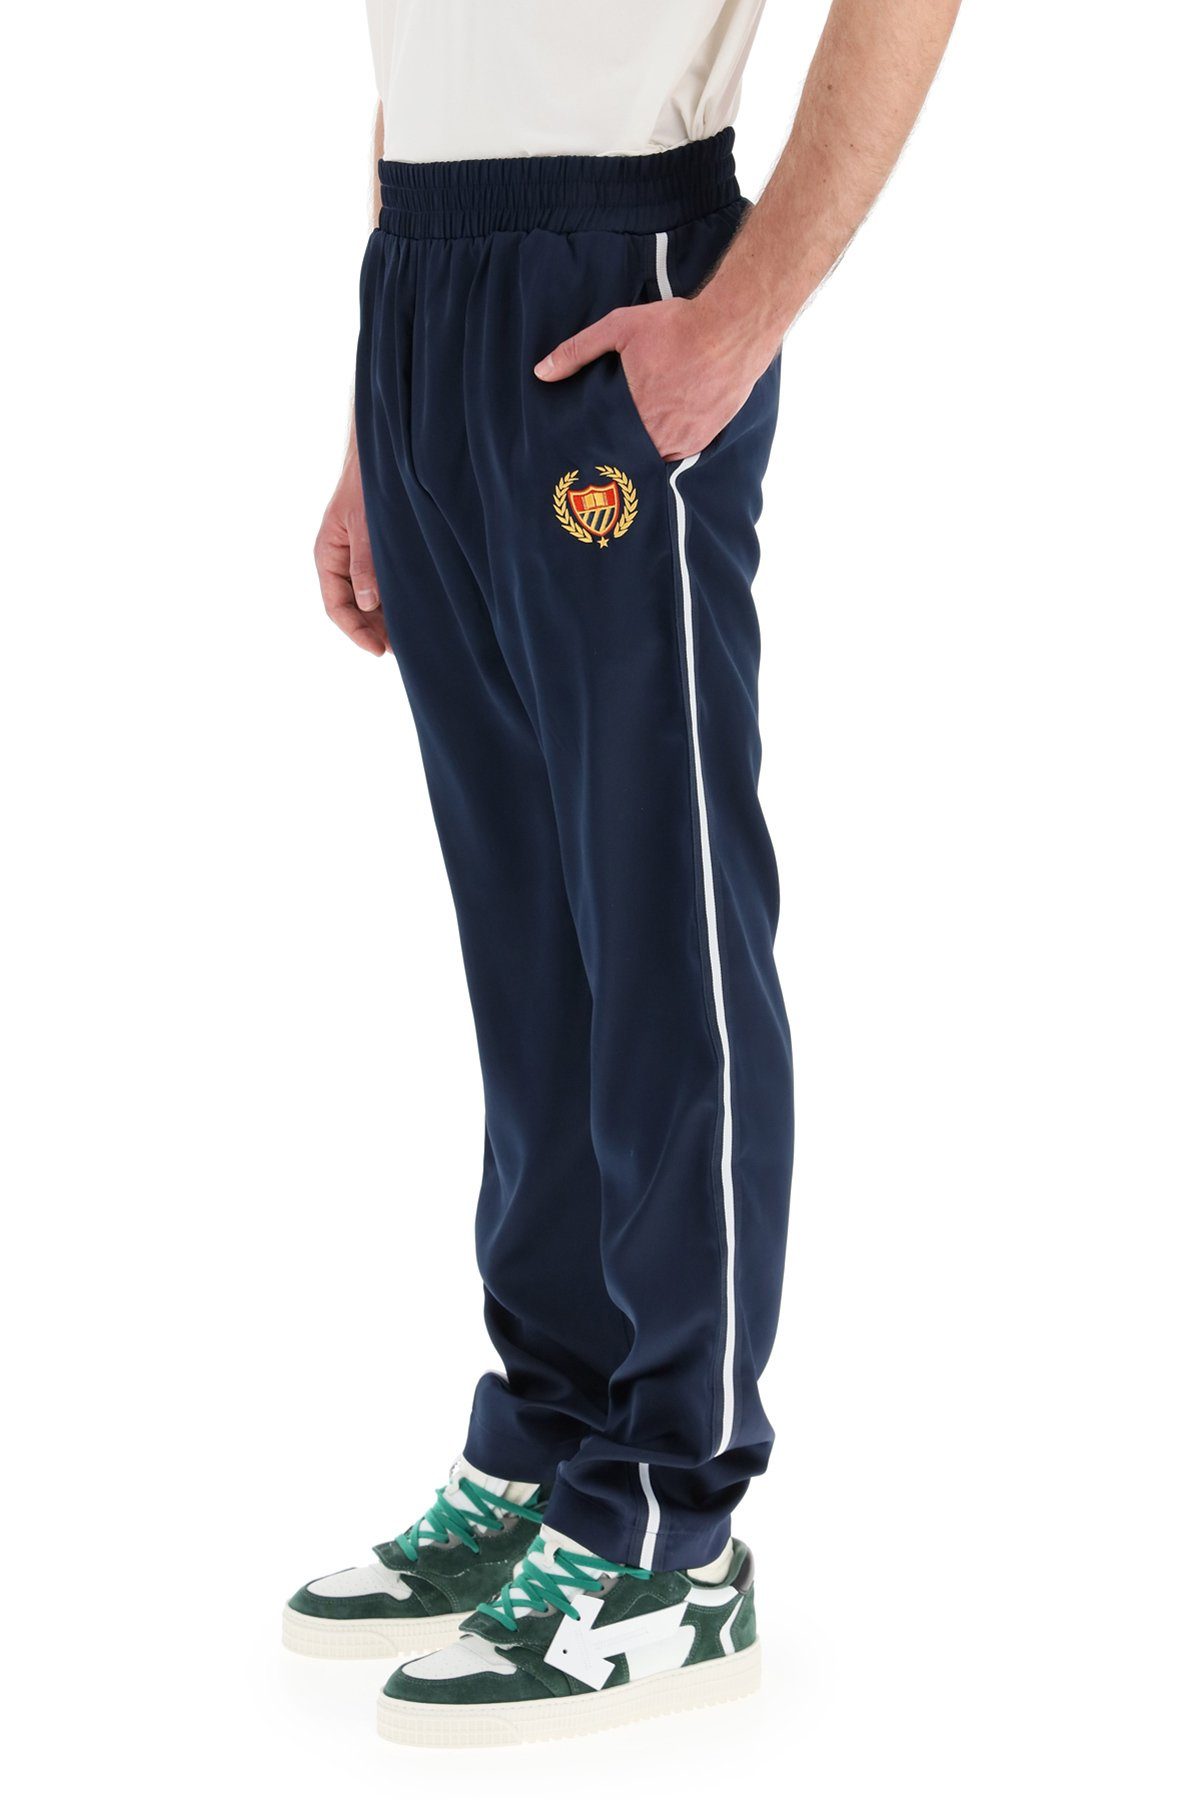 Bel-air athletics pantaloni sportivi trank